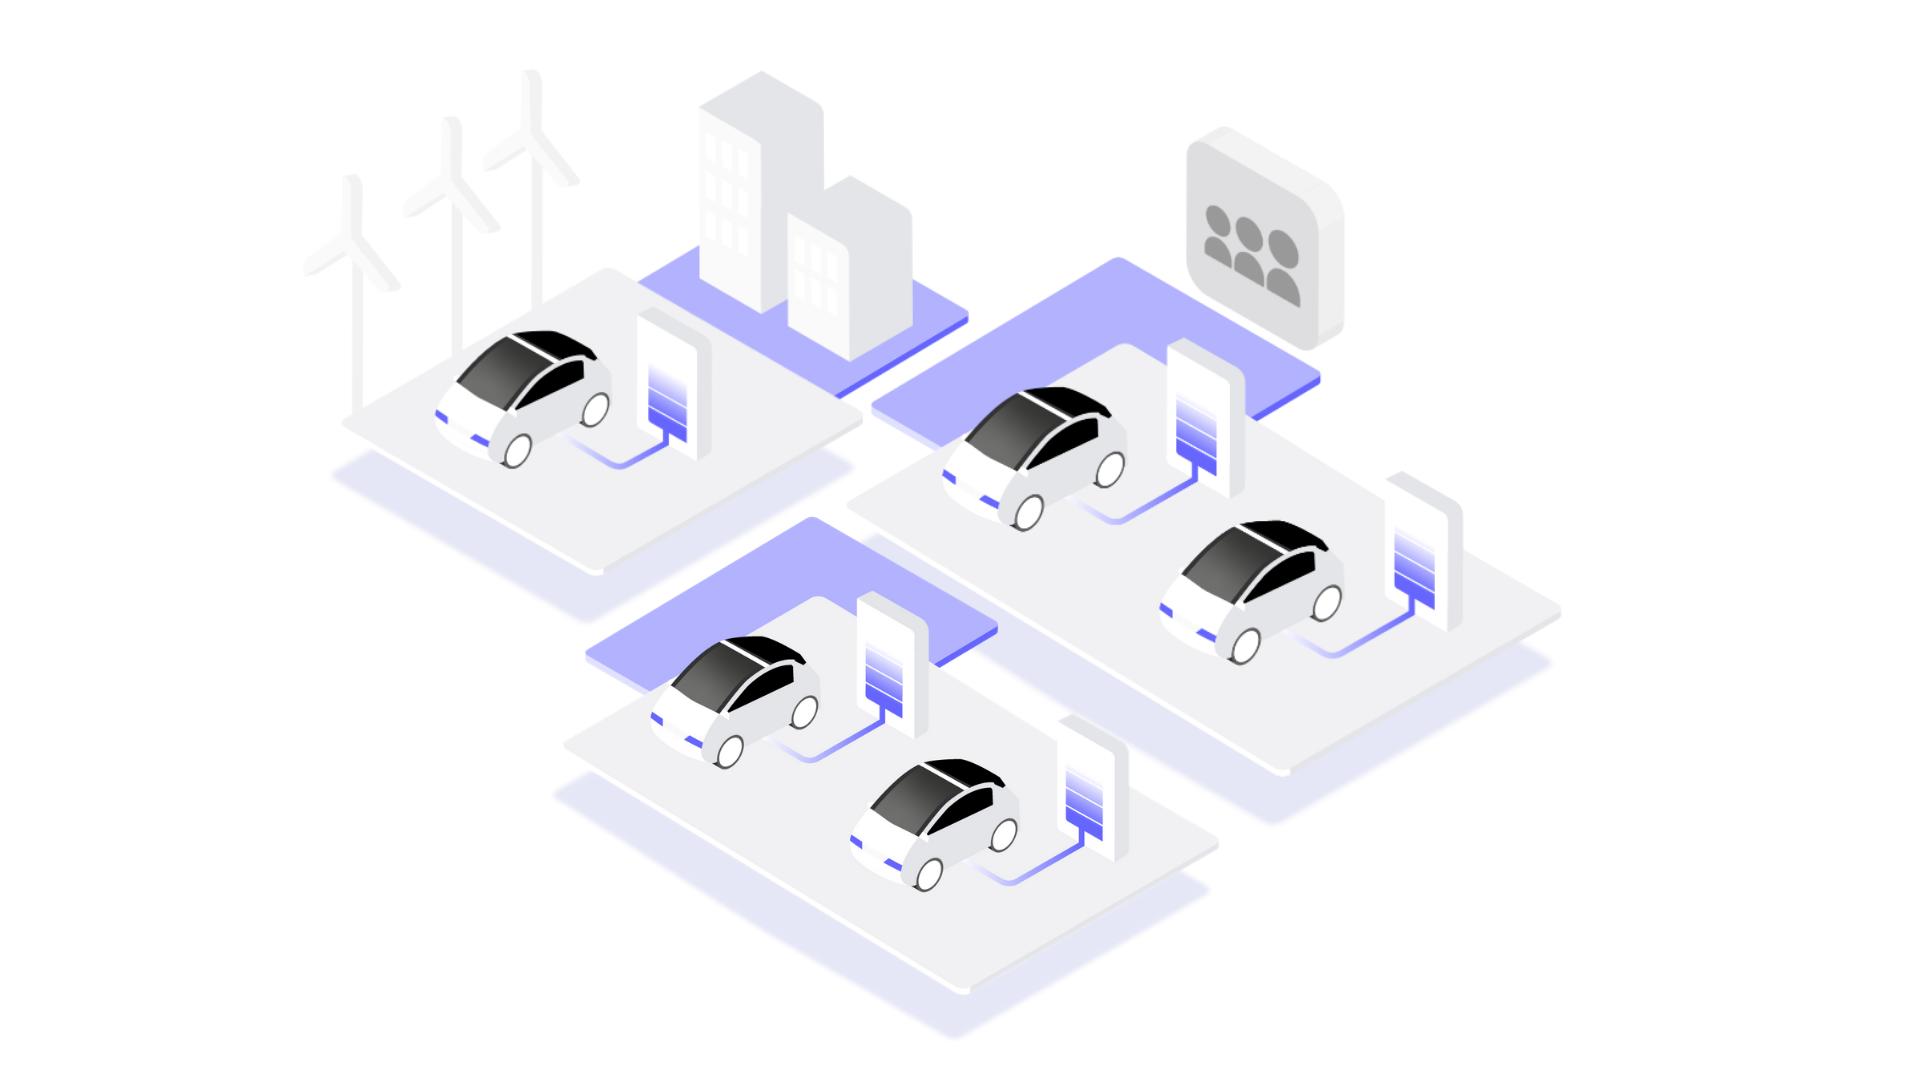 Unlocking eMobility platform using Open Standards - header